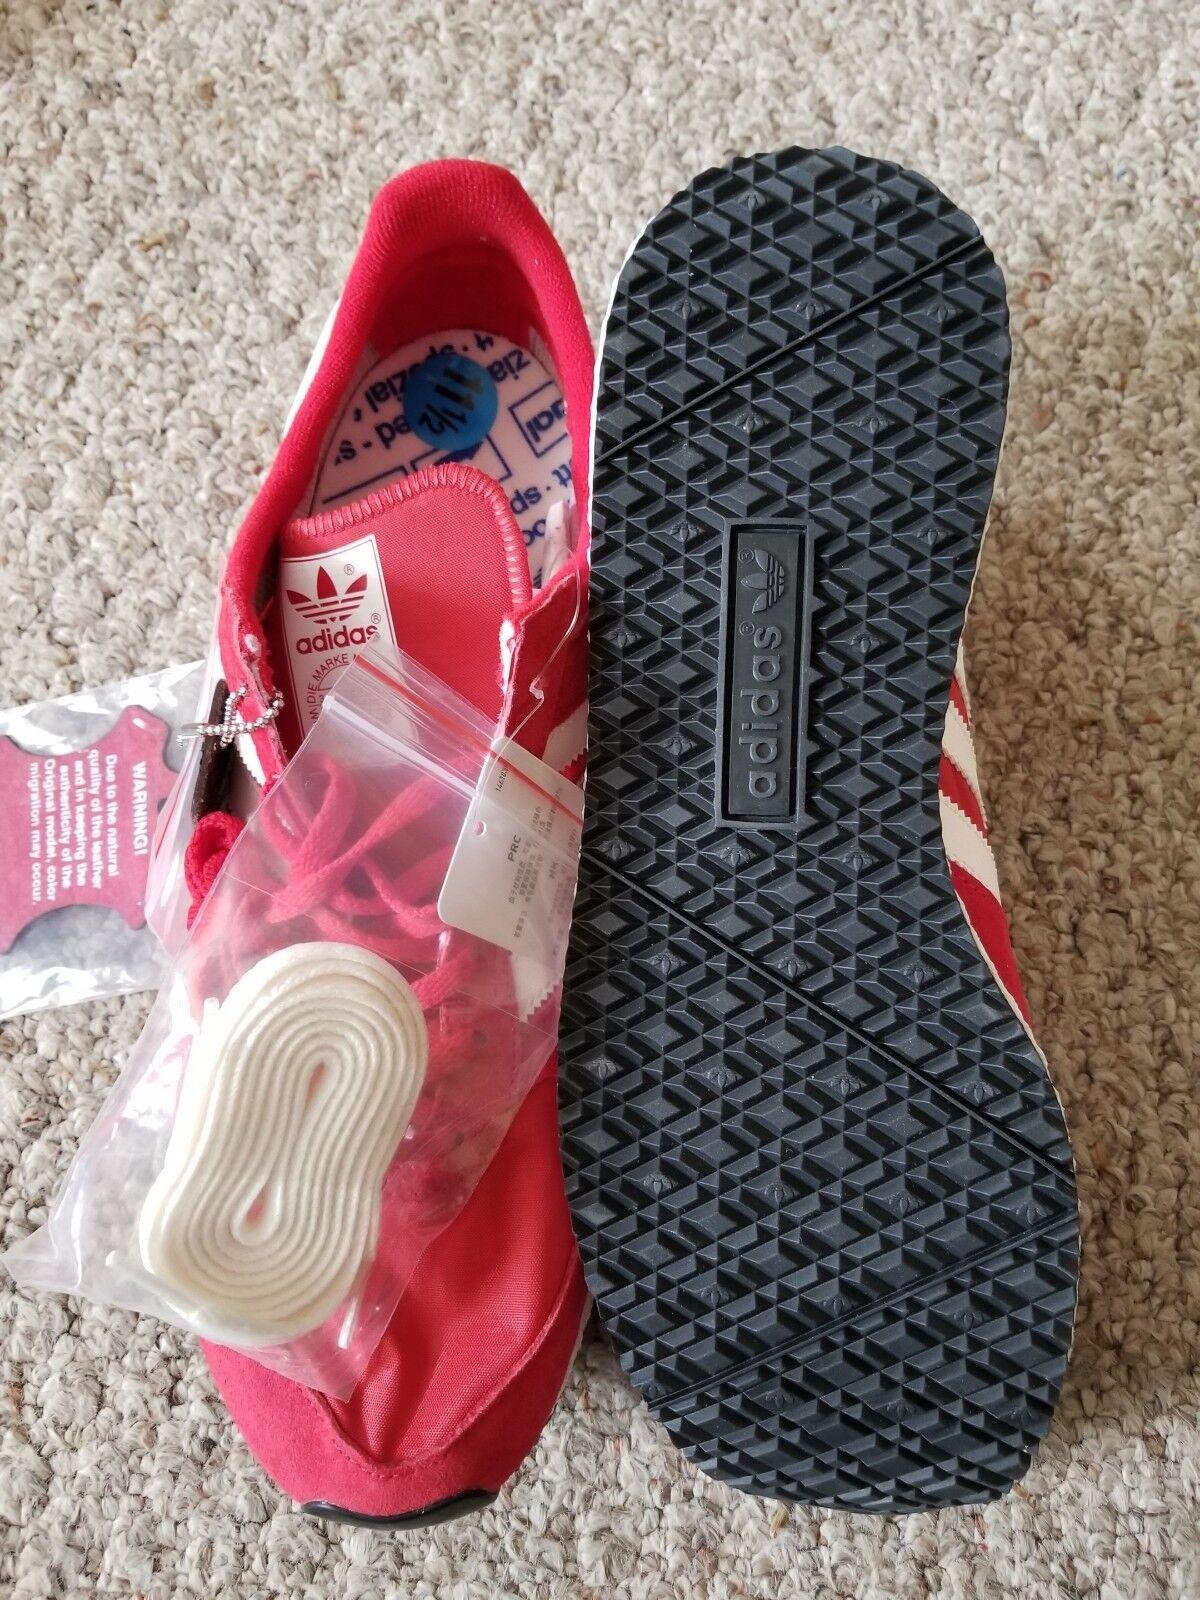 New Adidas Originals Atlanta Spezial Scarlet Red White Men 11.5 BY1880